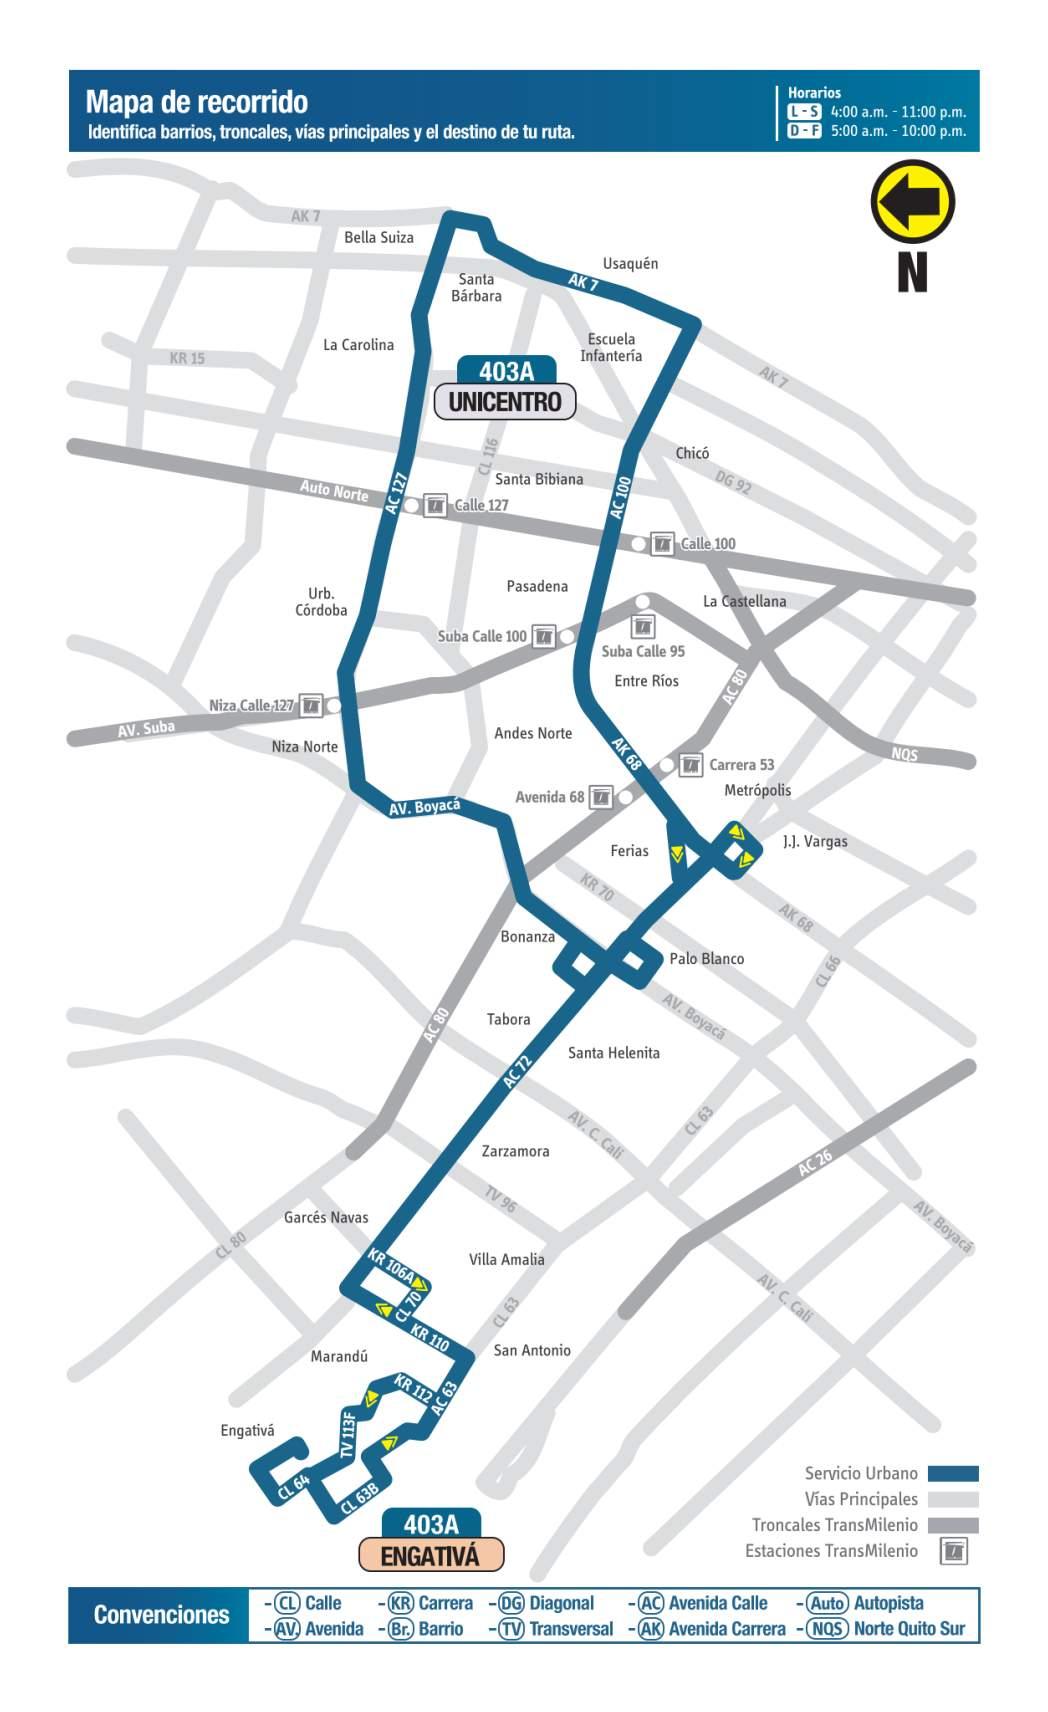 403A Engativá - Unicentro, mapa bus urbano Bogotá